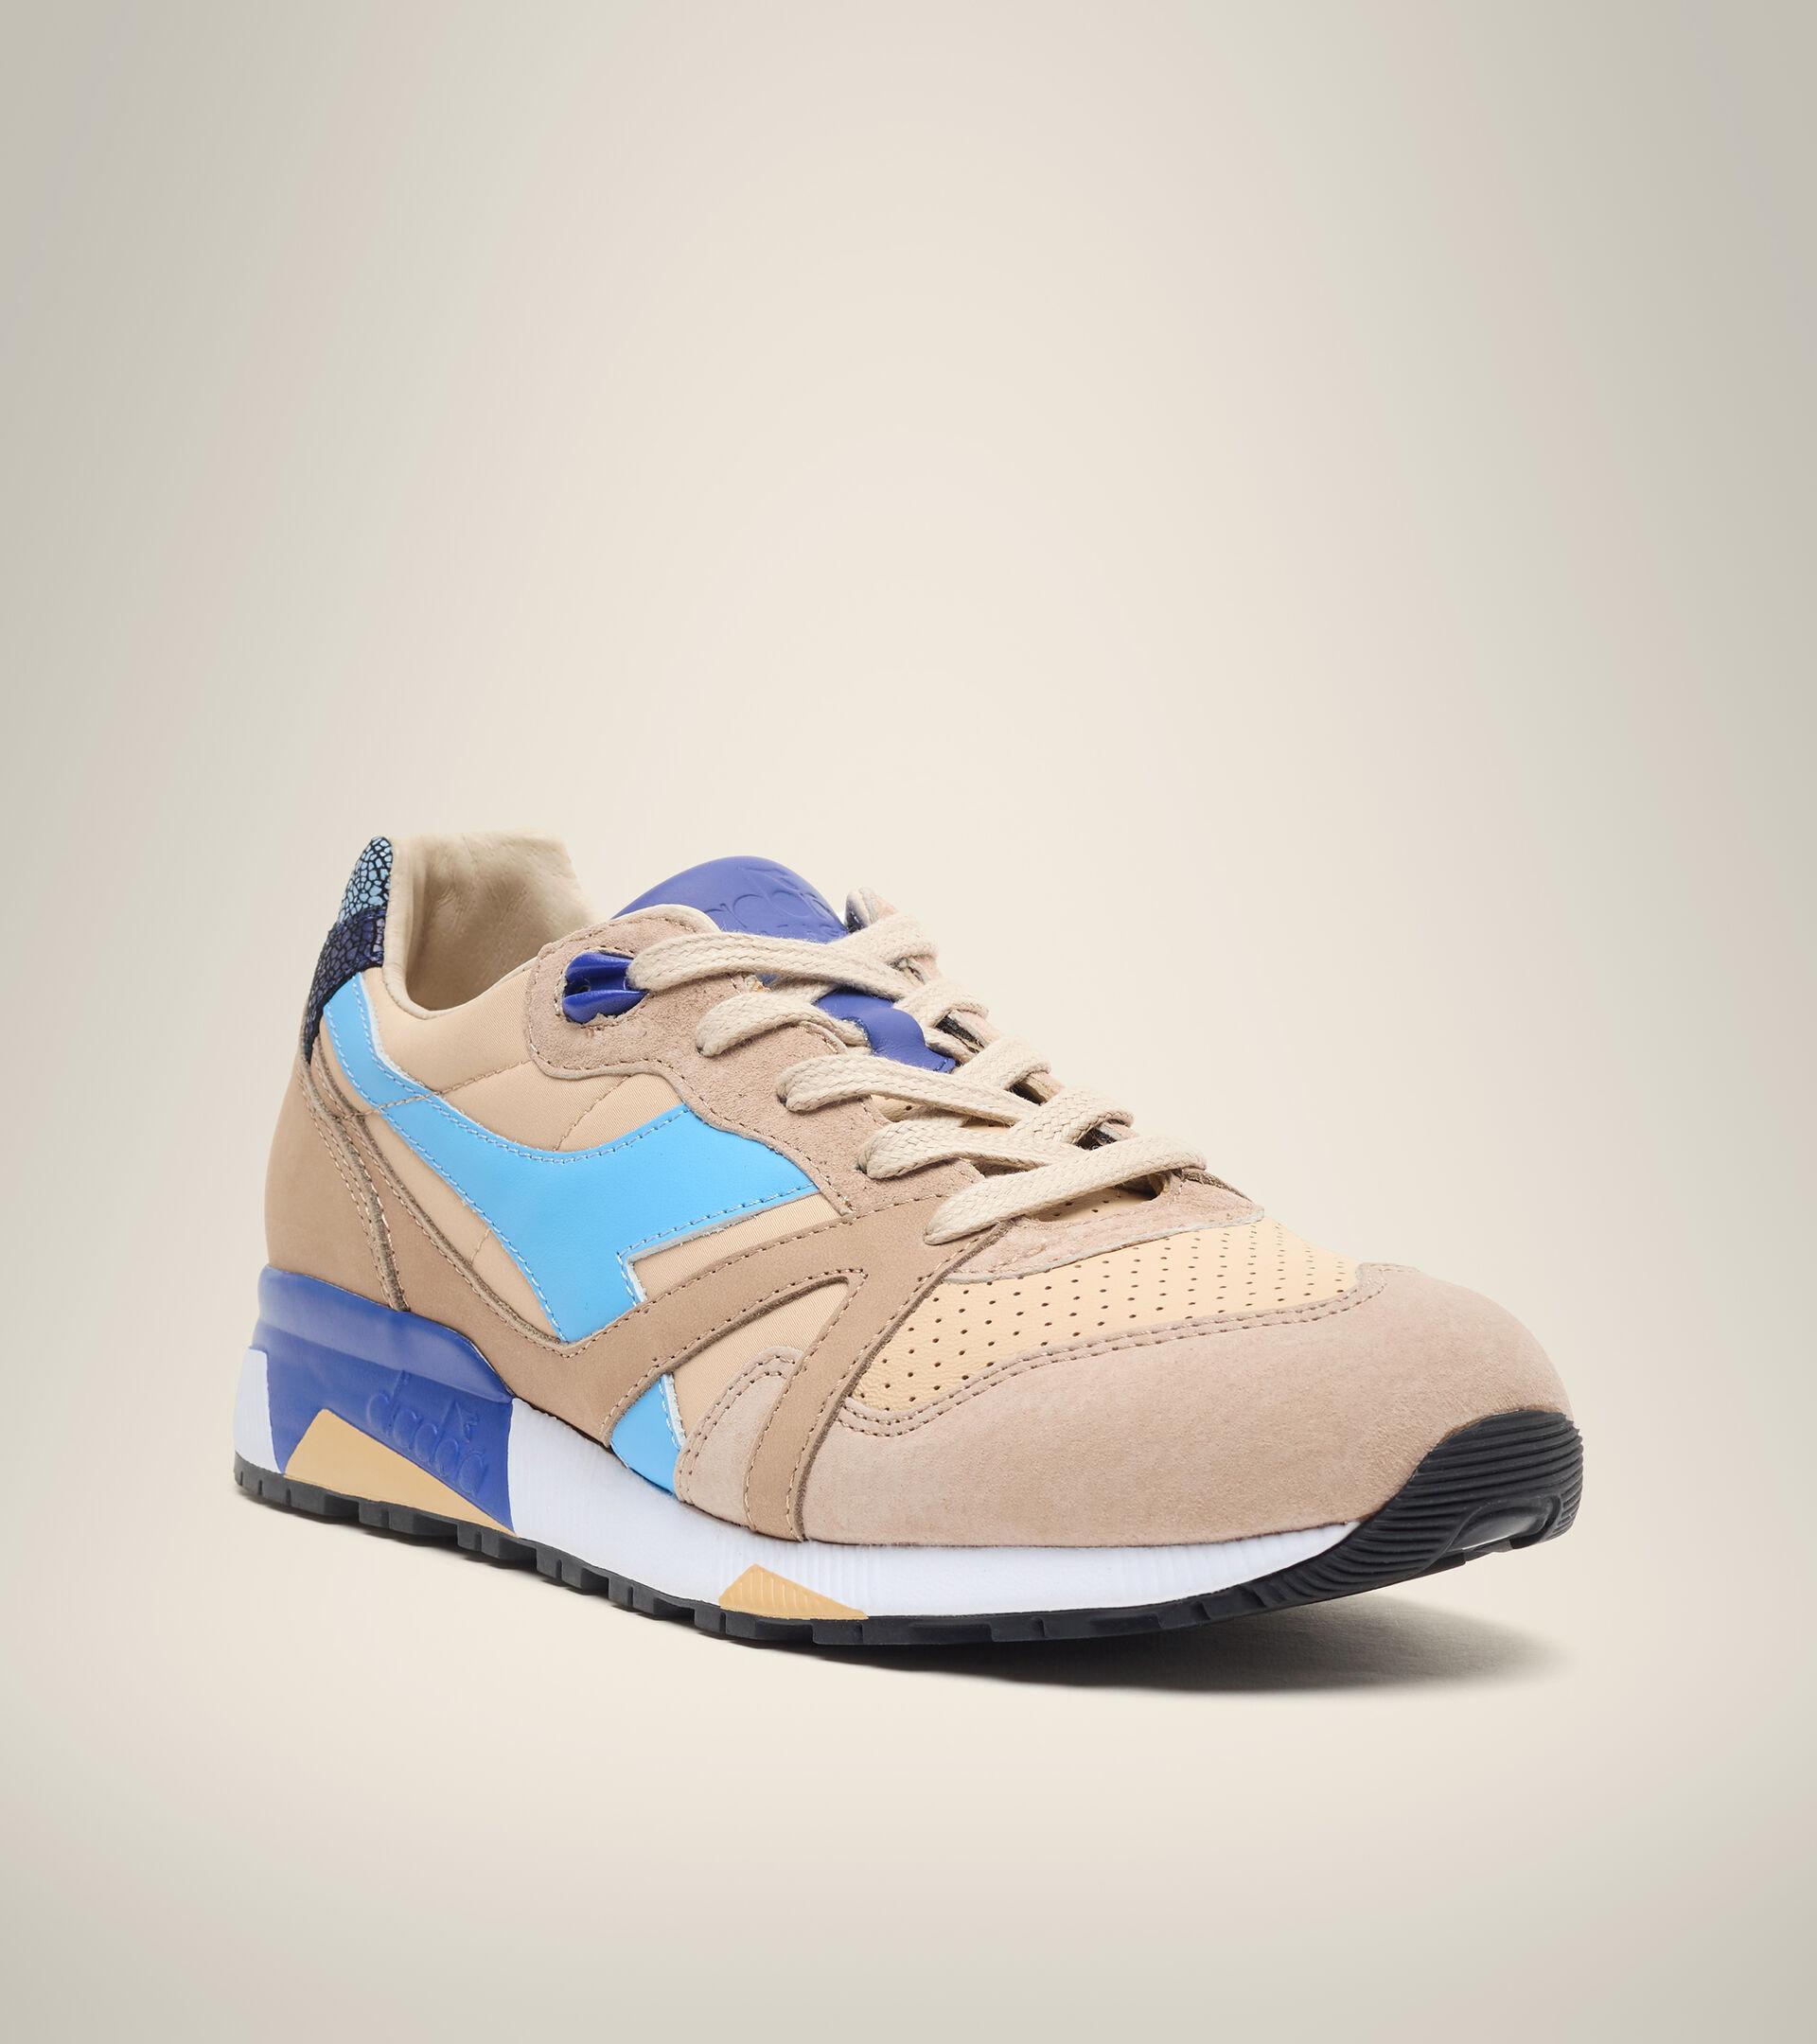 Made in Italy Heritage Shoe - Men N9000 ITALIA BEIGE - Diadora